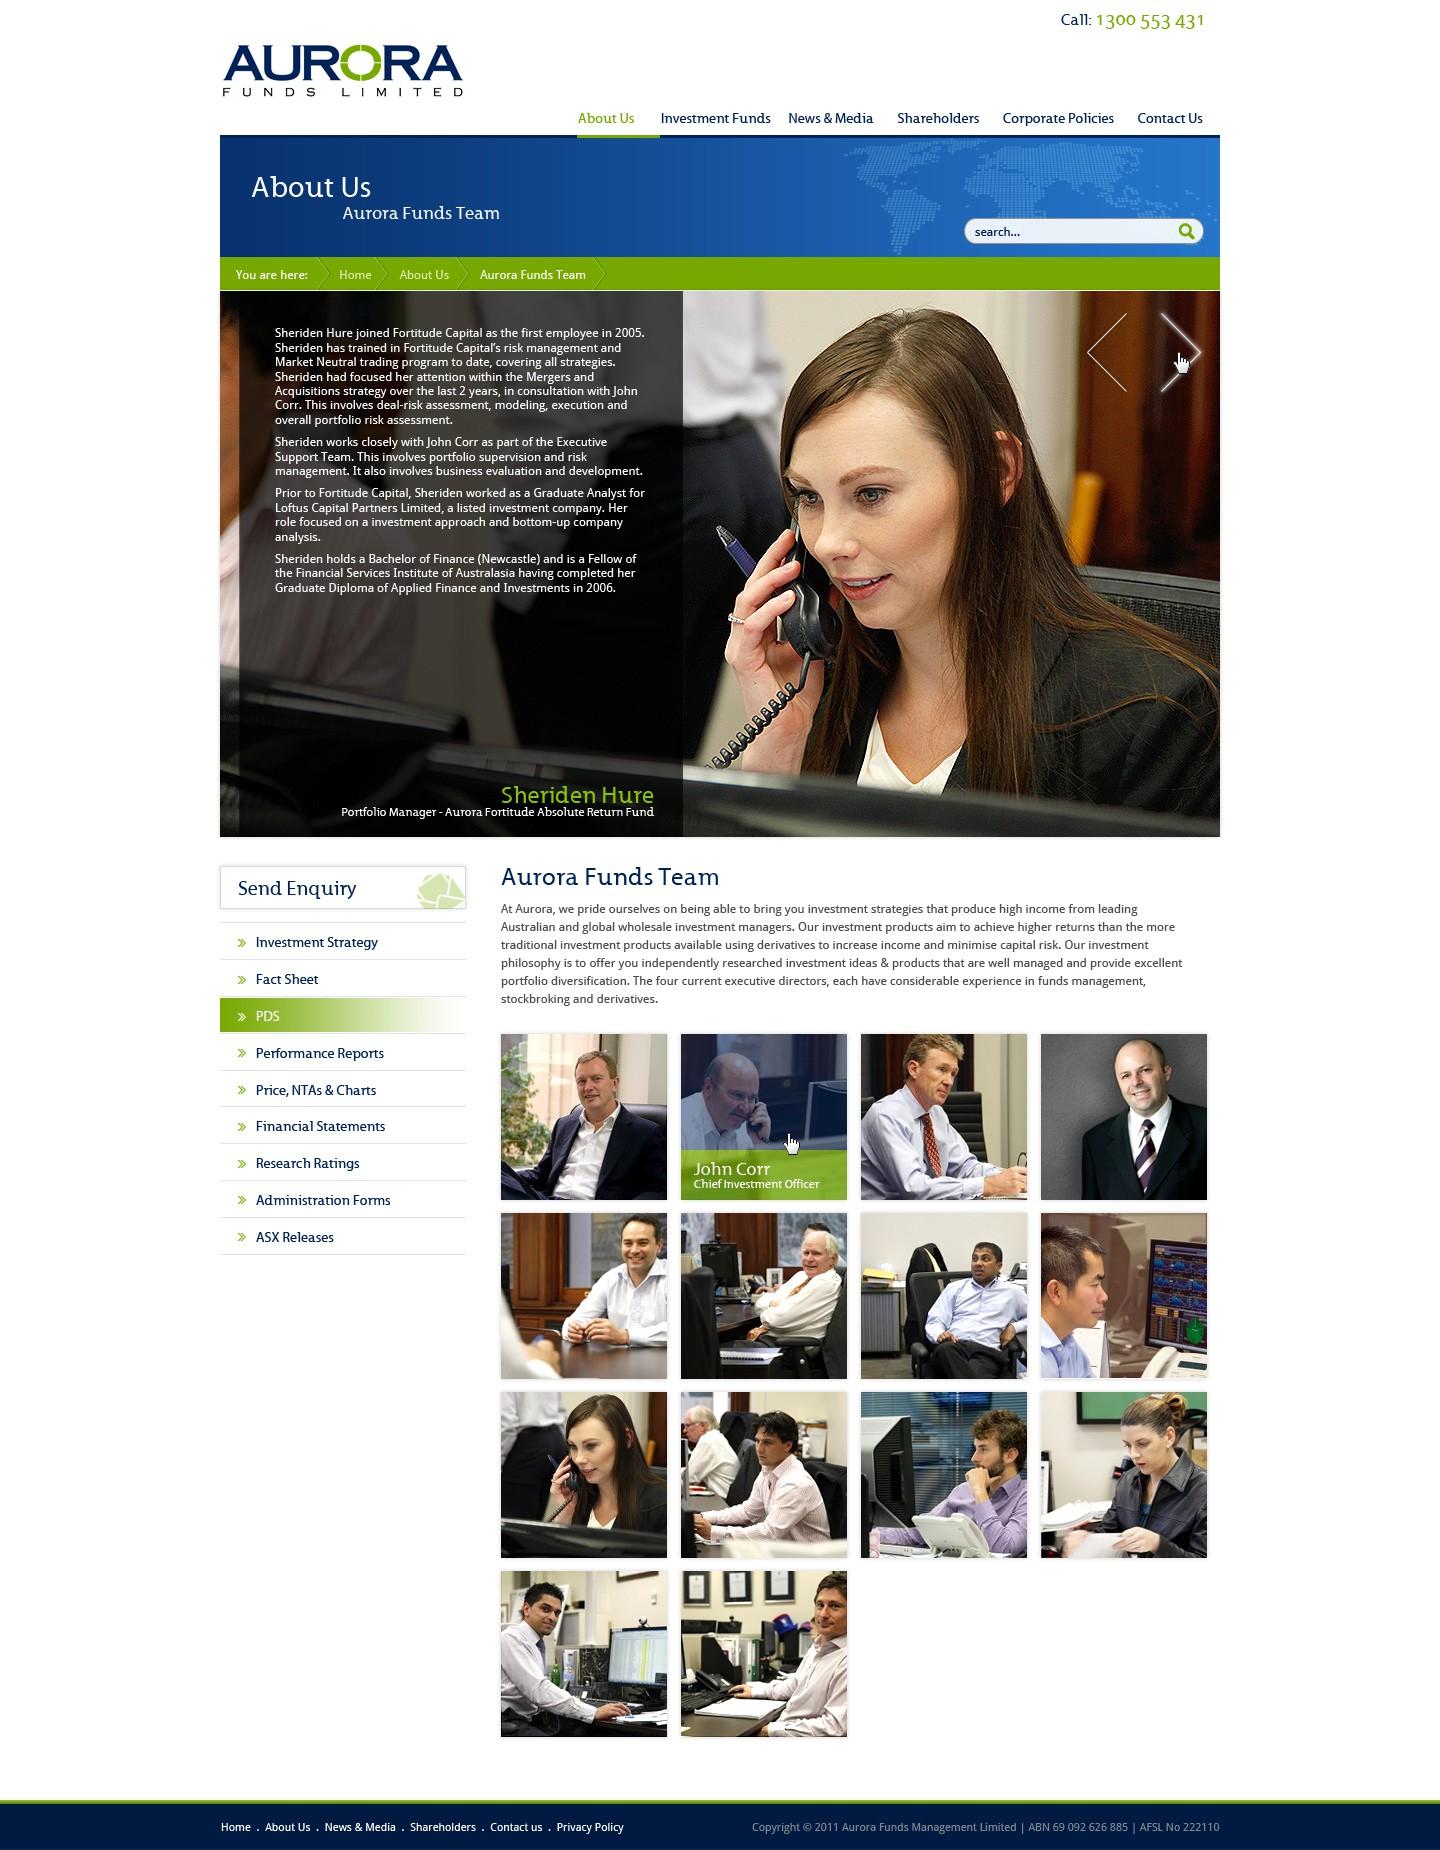 Help Aurora Funds Management with a new website design